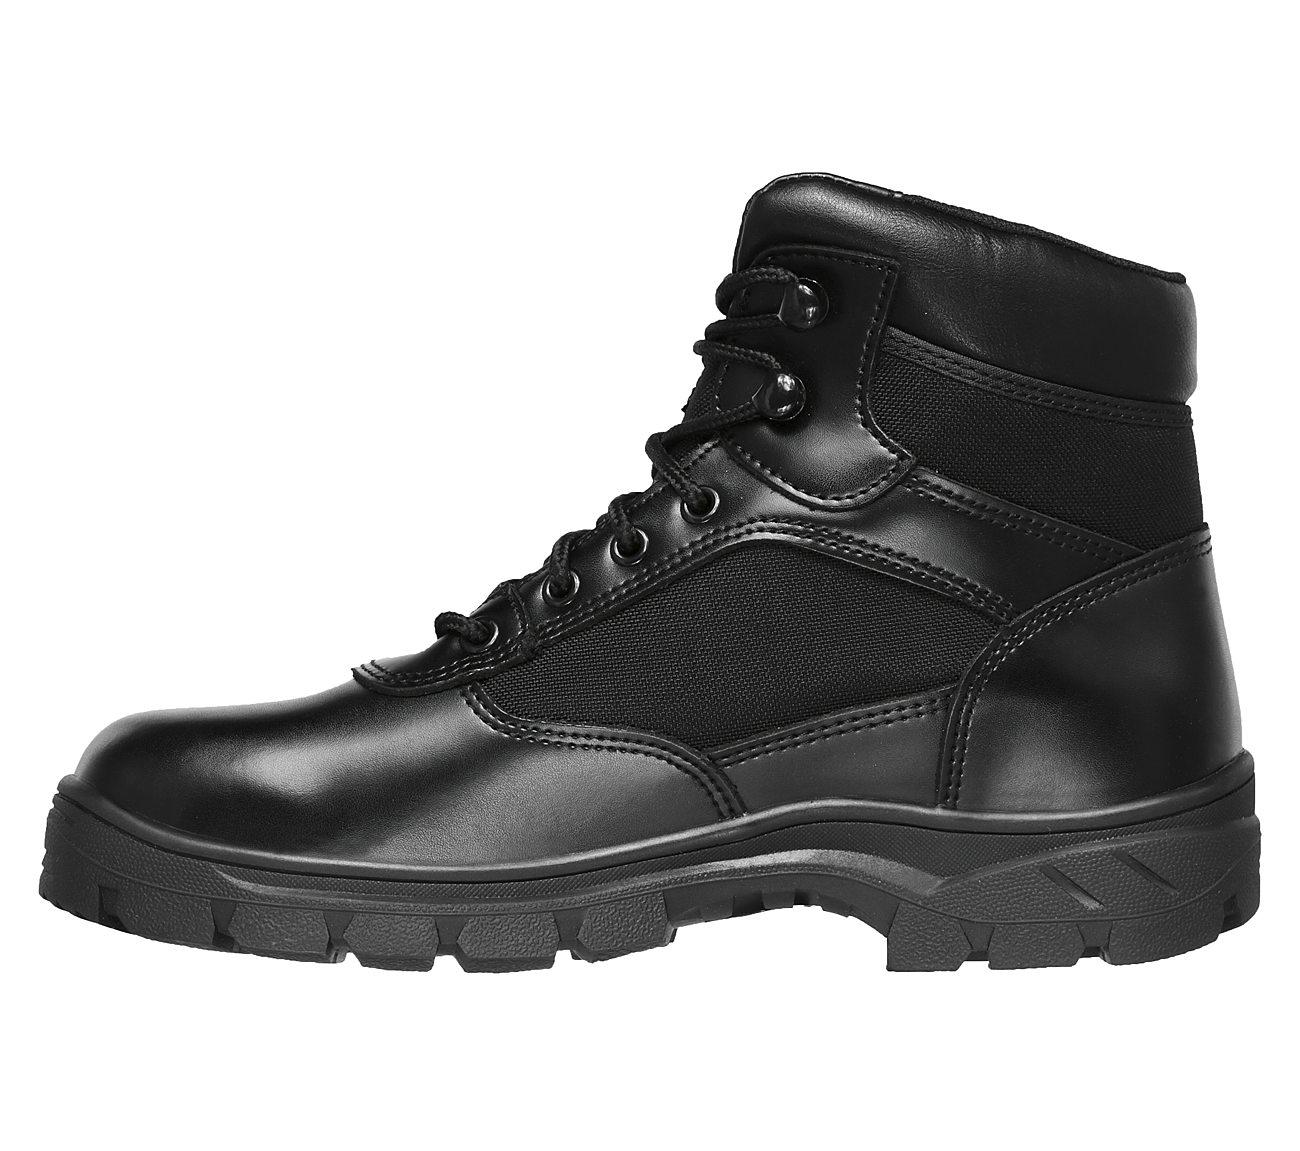 Benen Wp Tactical Black Blk Mens Tactical Boots Size 13W Skechers Wascana